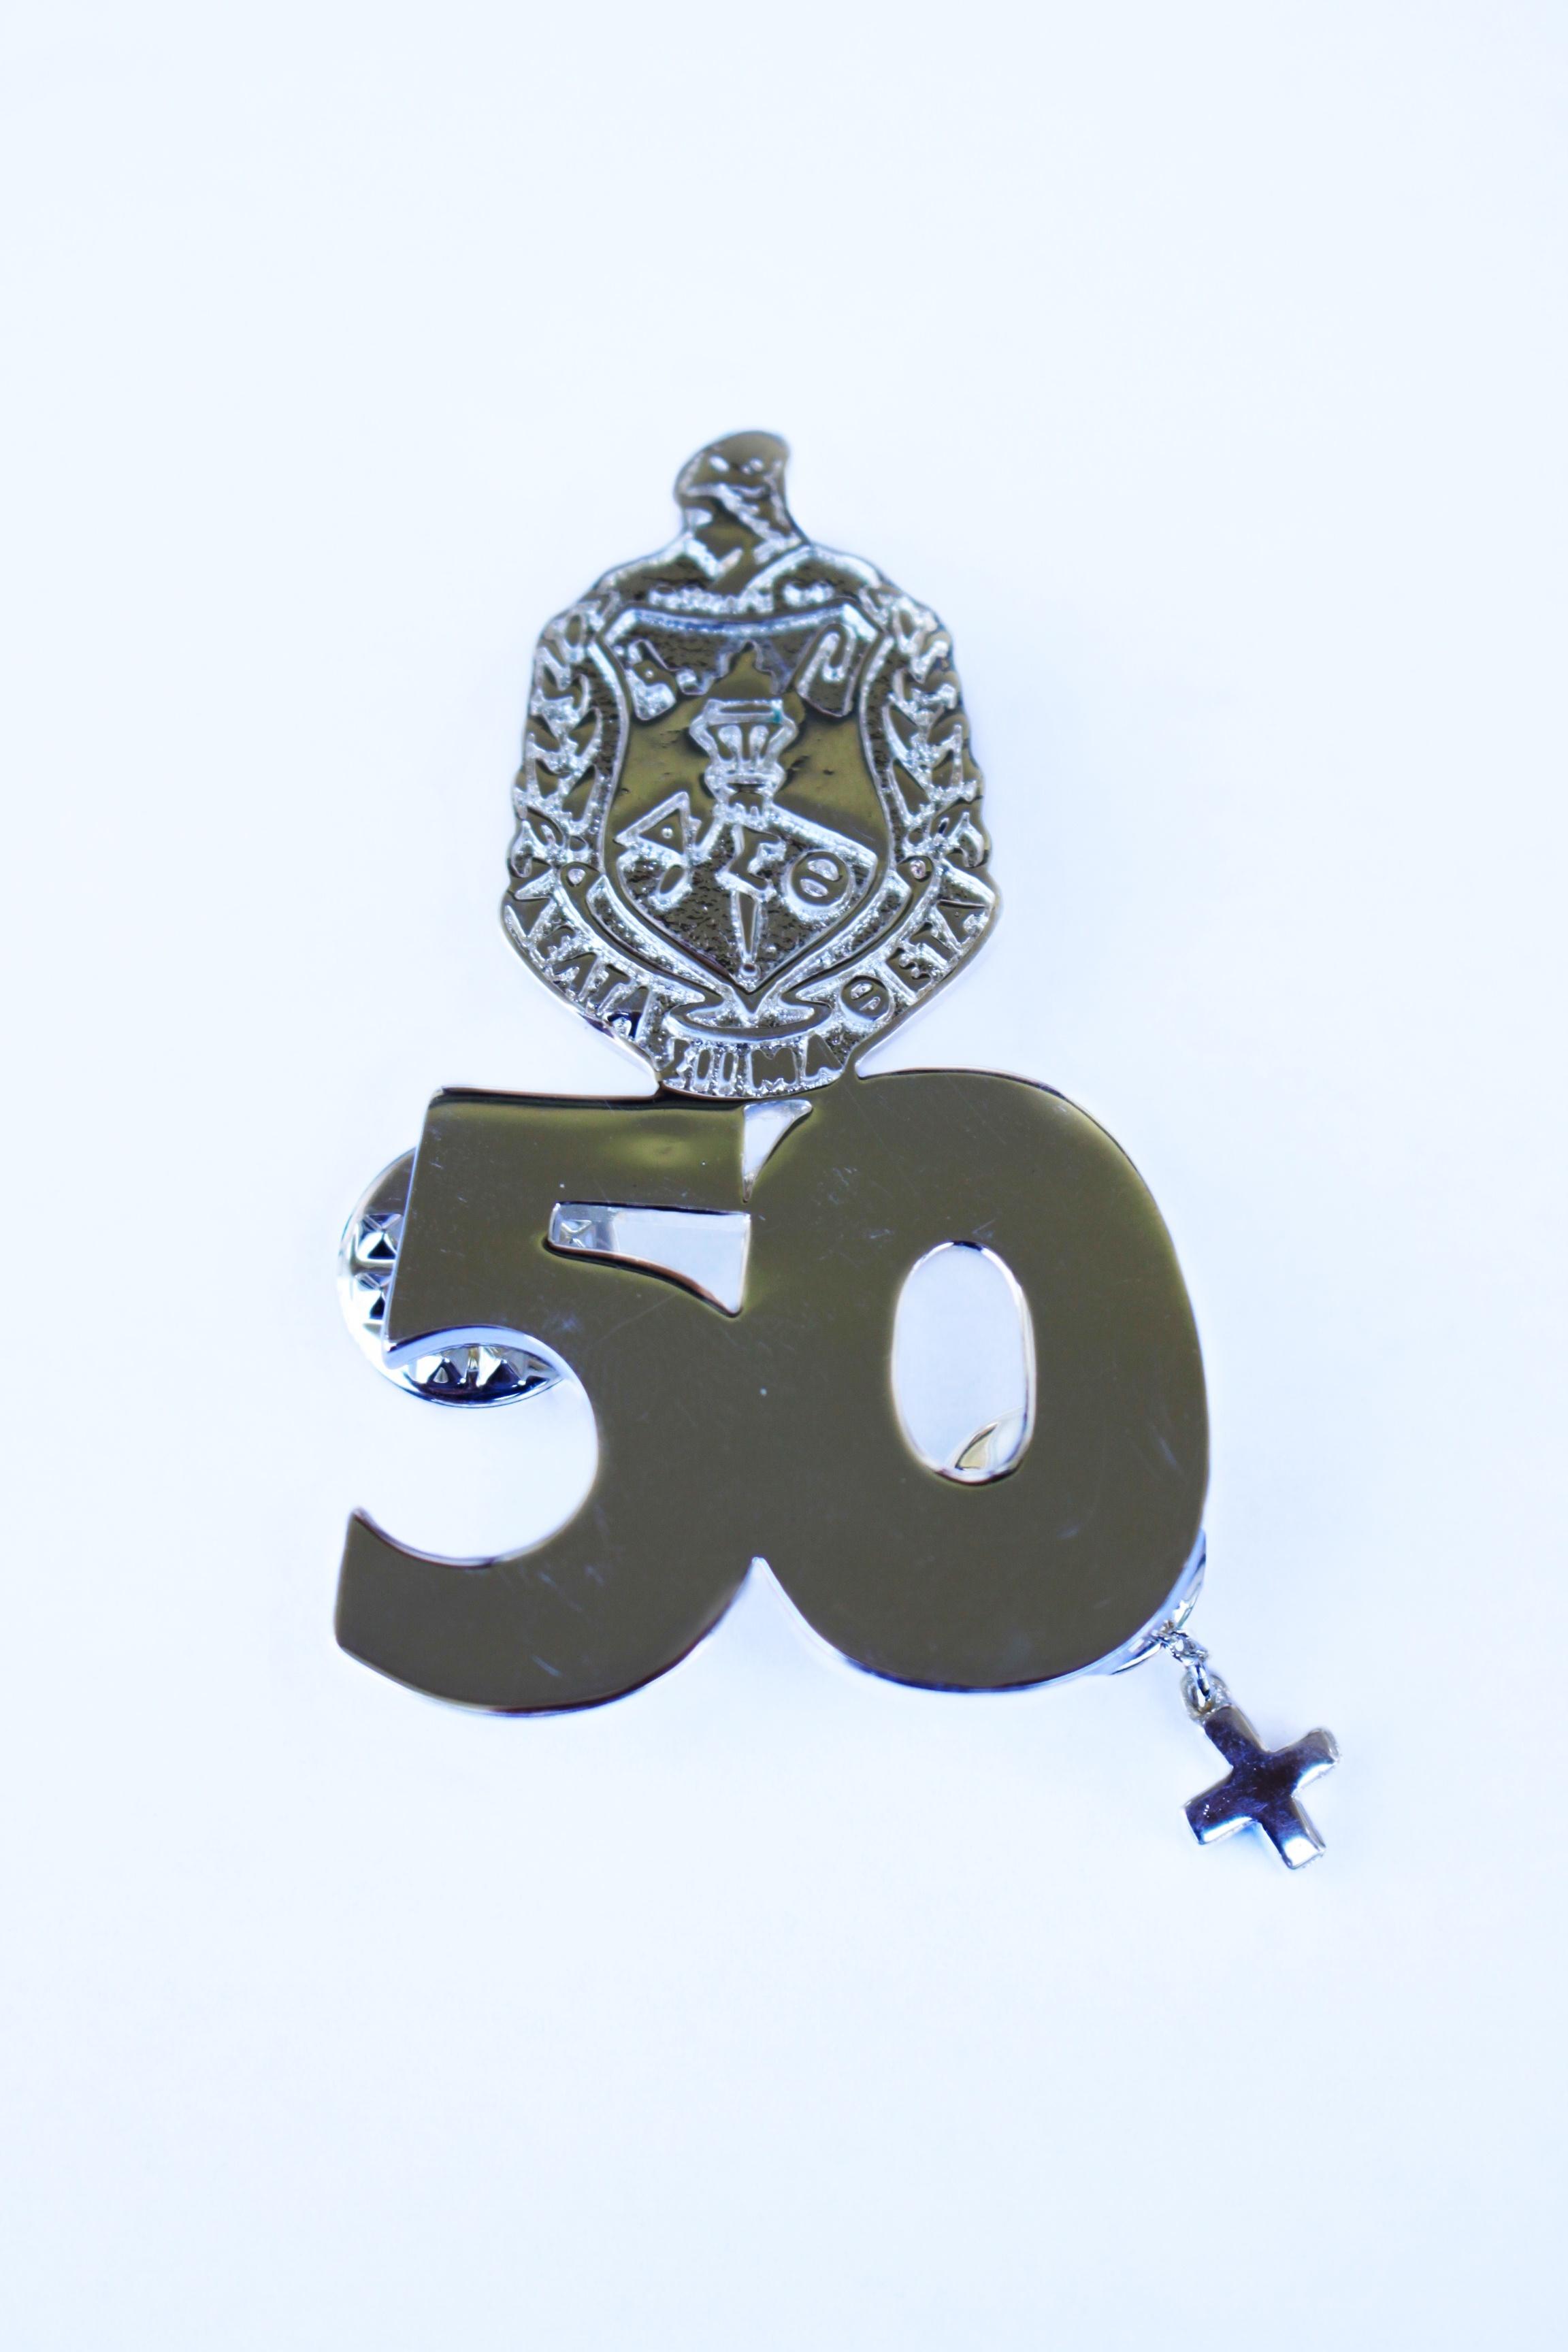 High Polished Gold 50 Year Sorority Pin - + guard 00102